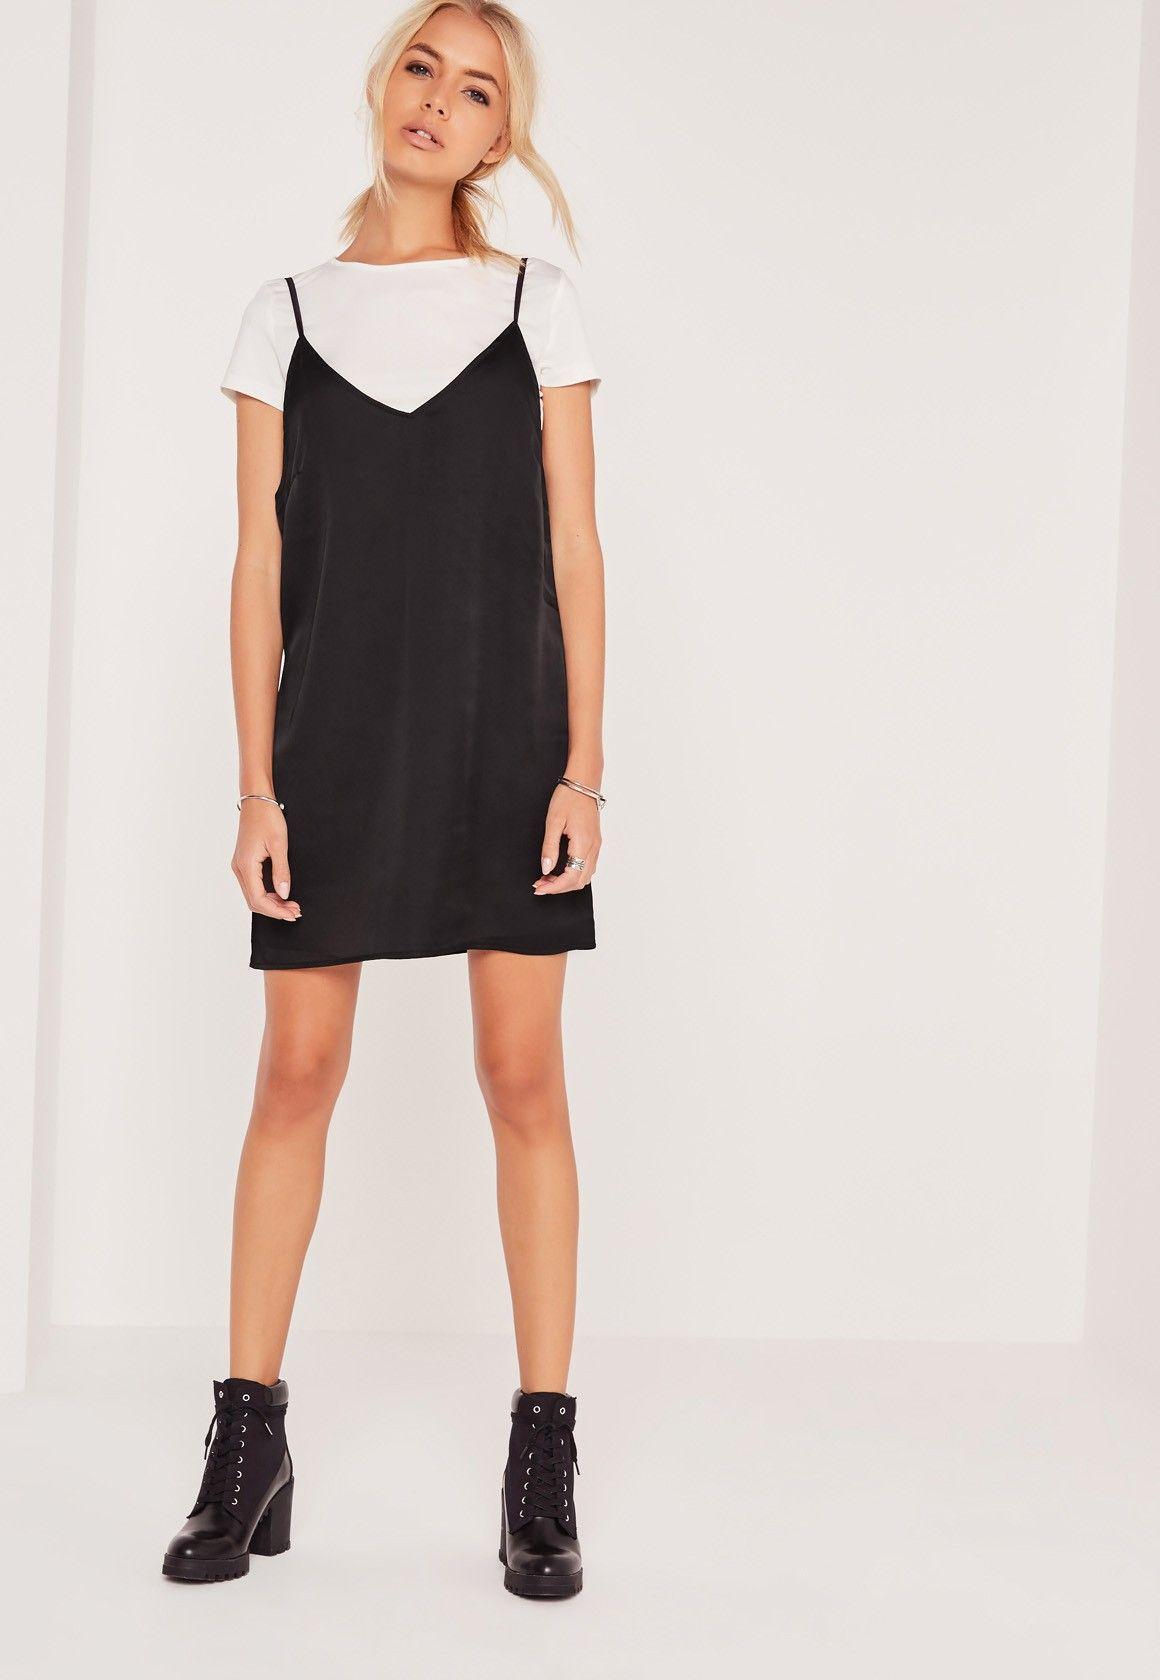 Missguided Satin 2 In 1 Dress Black Black Cami Dress Casual Dress Outfits Shirt Under Dress [ 1680 x 1160 Pixel ]